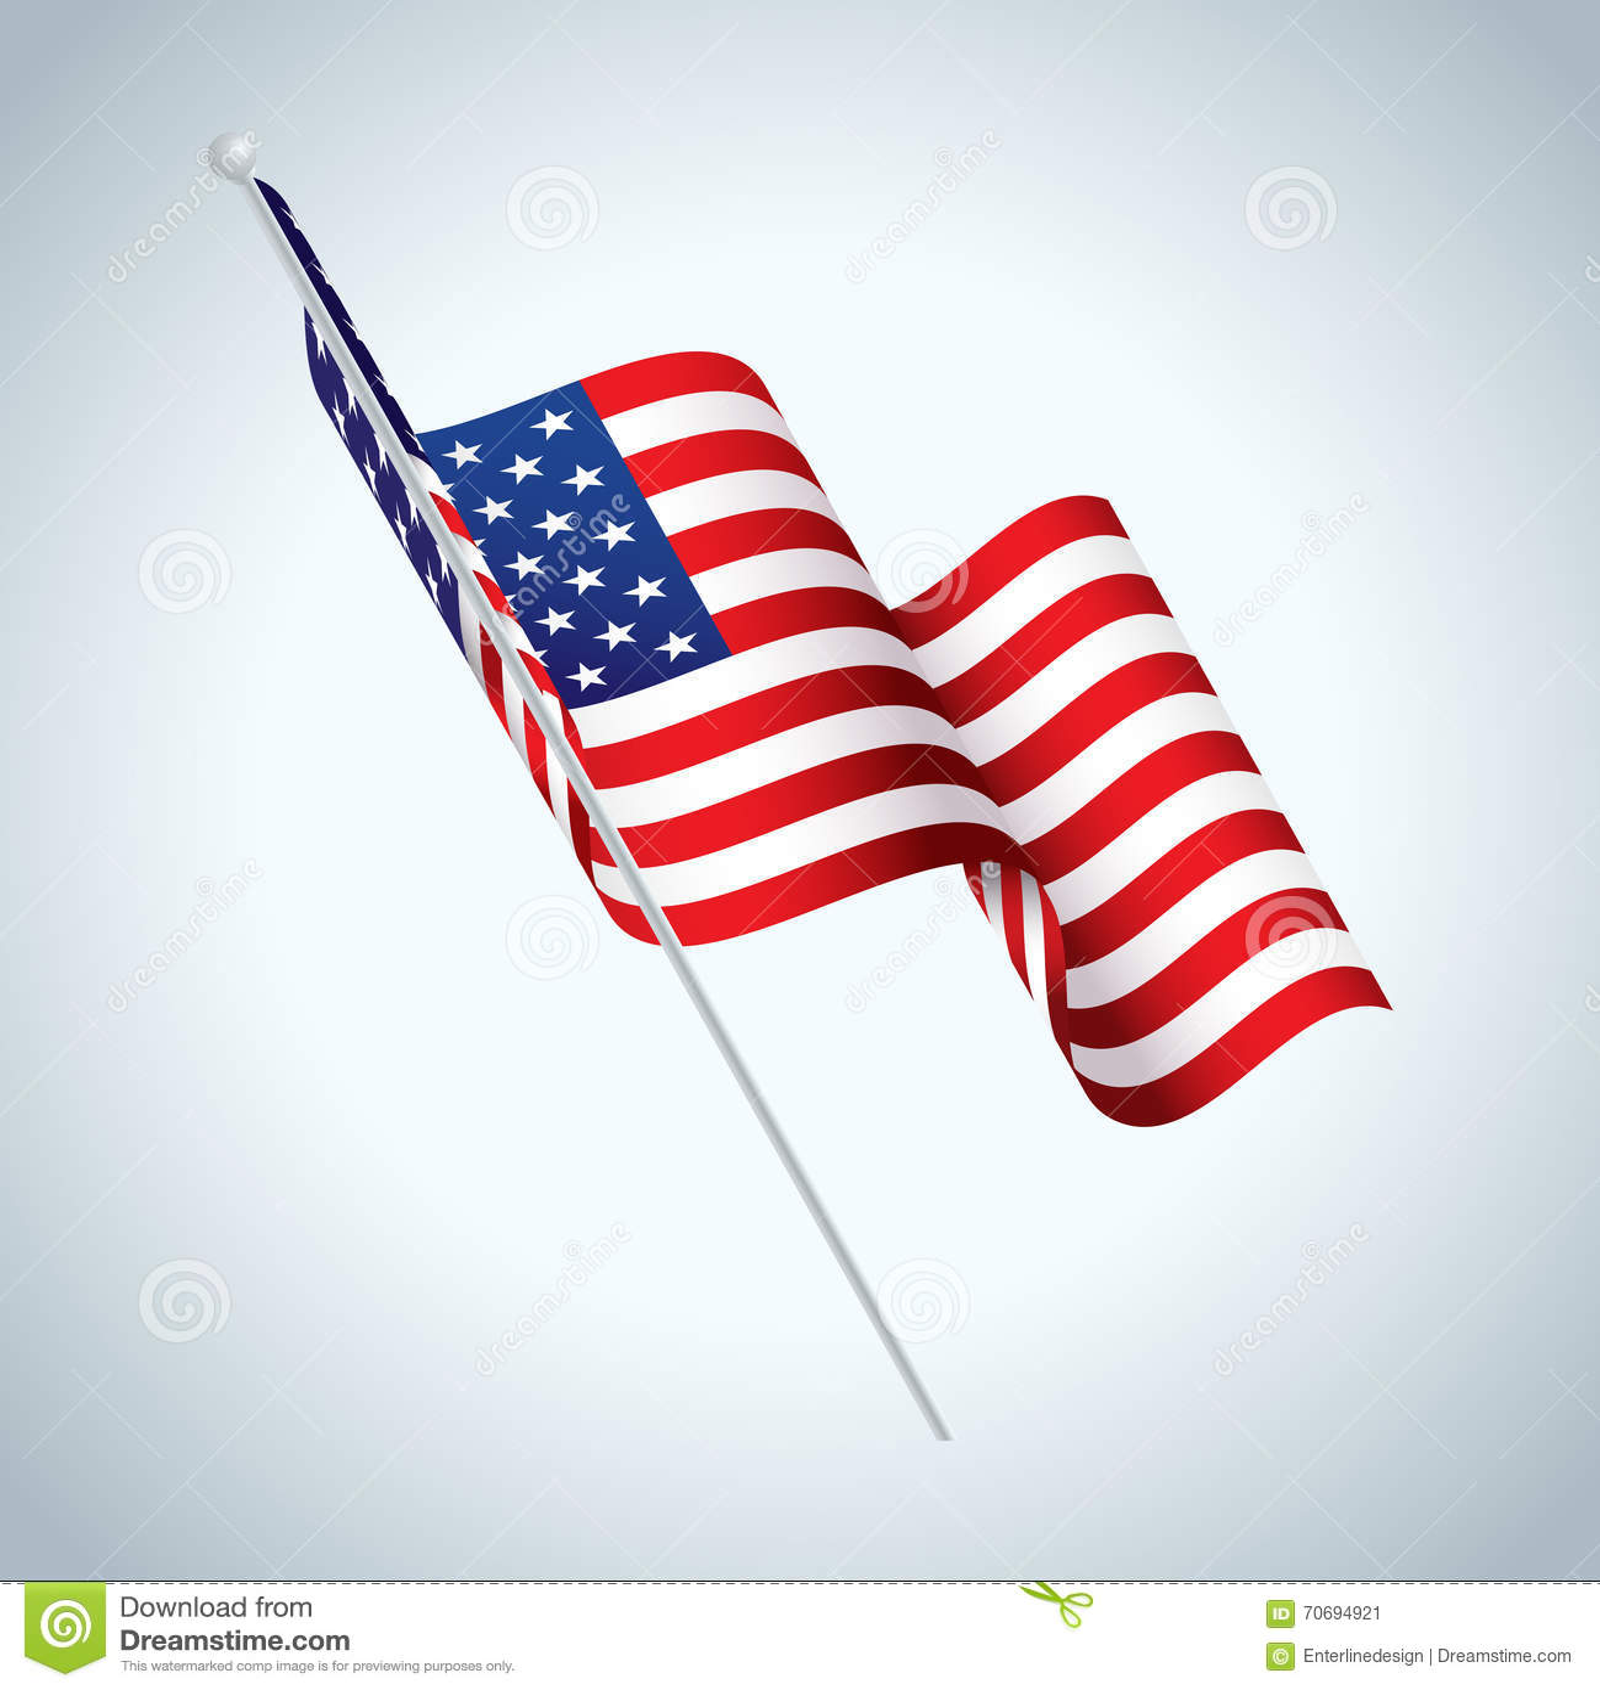 086aa400e73 Royalty-Free Vector. American Flag on Pole Waving Illustration